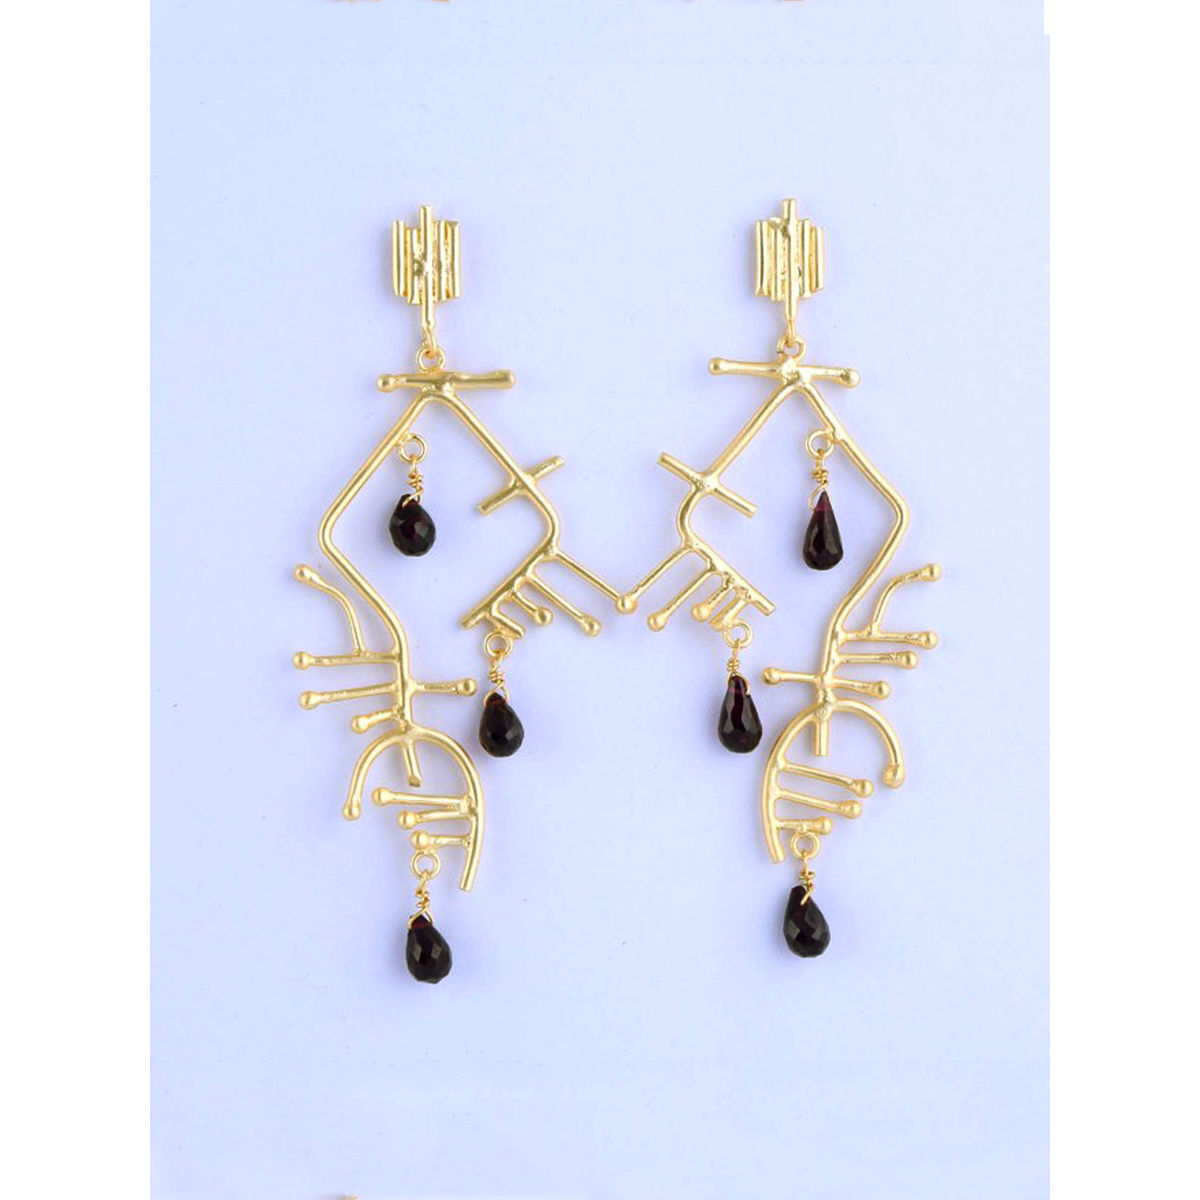 Helios semi precious metal earrings